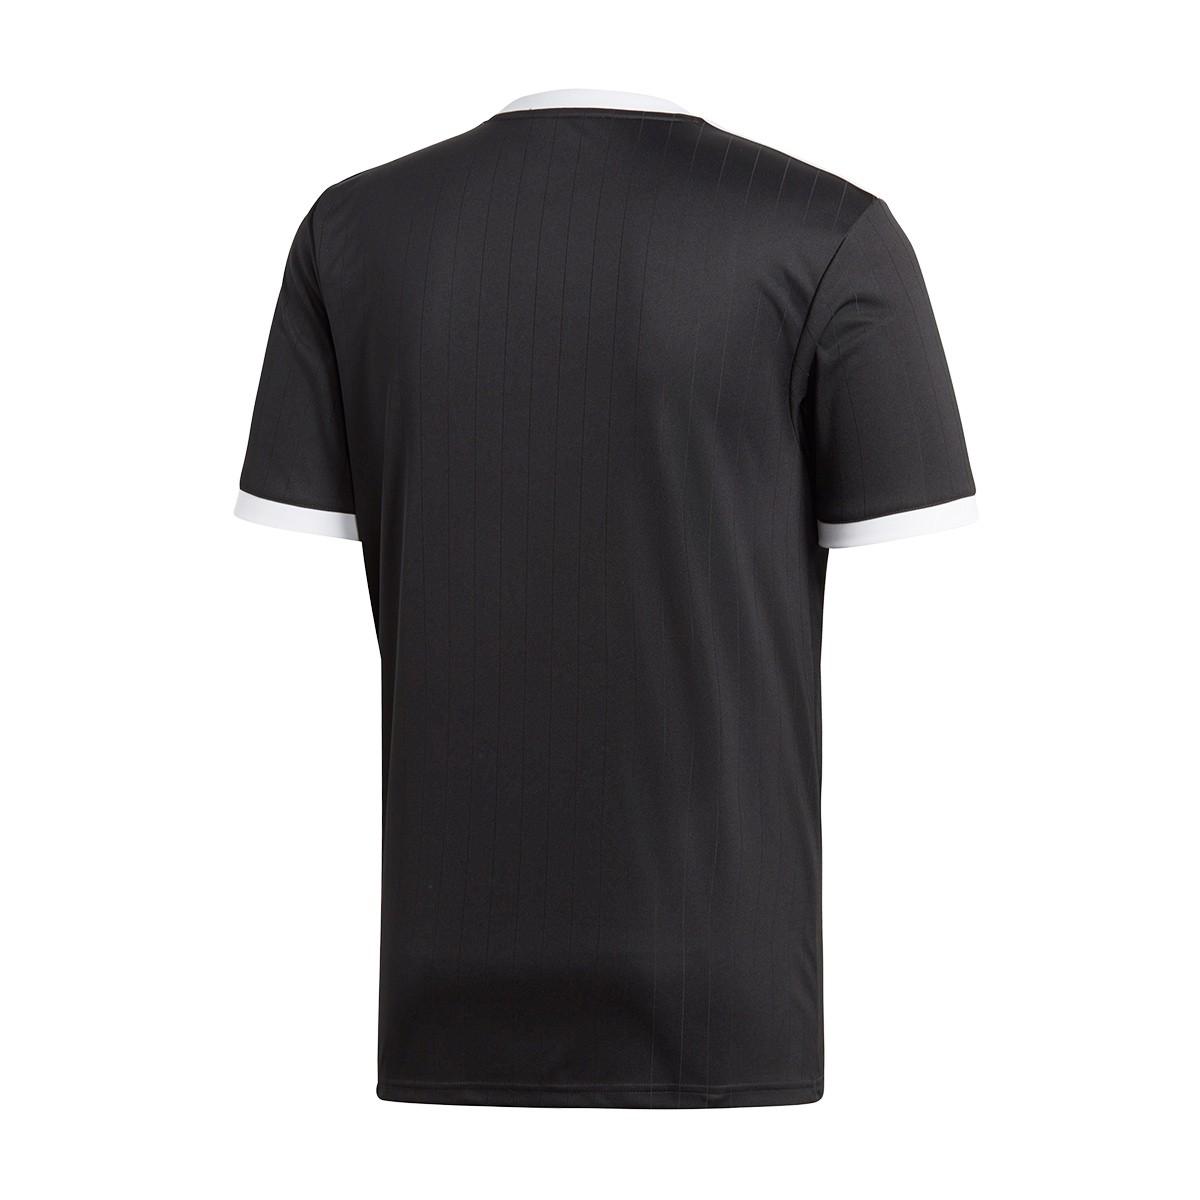 Jersey adidas Tabela 18 m/c Black-White - Fútbol Emotion